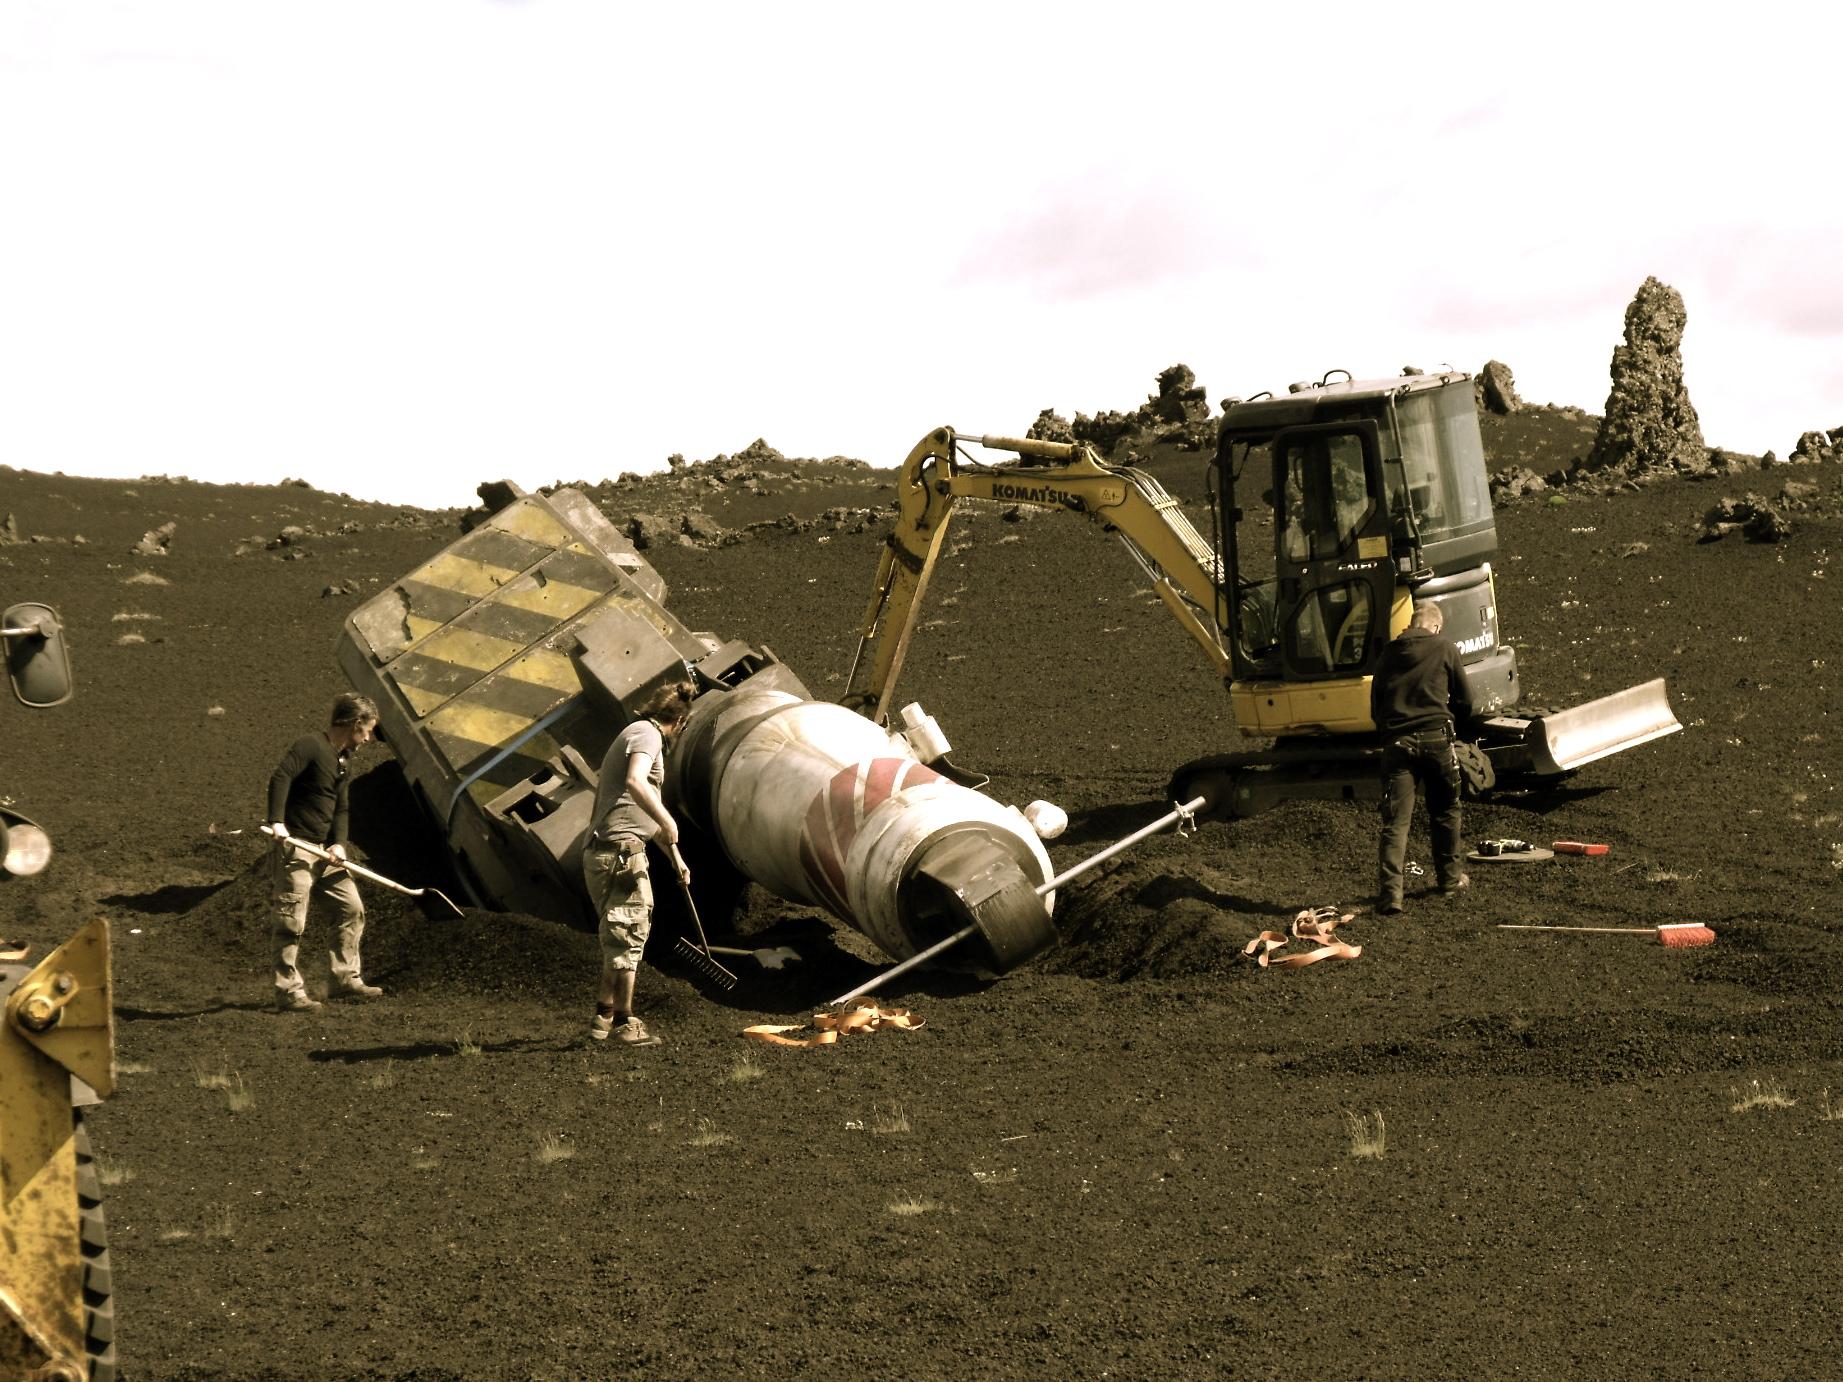 Digging in Crash leg